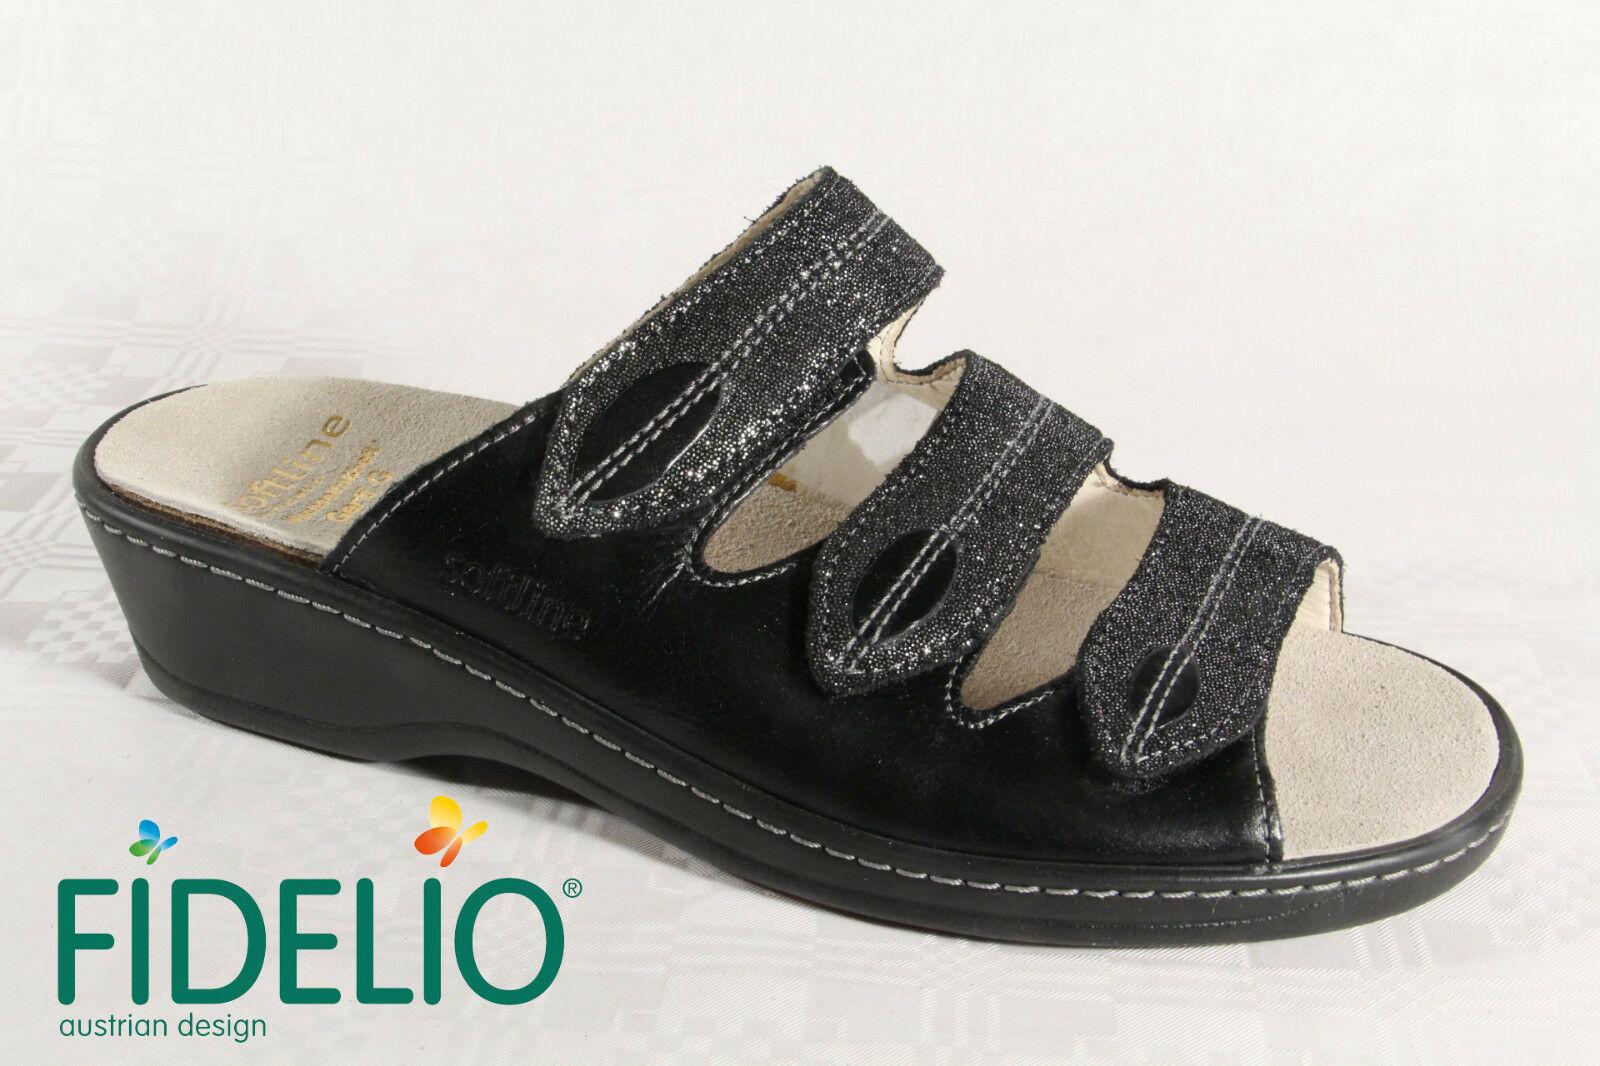 Fidelio Soft Line Damen Pantolette Pantoffel Echtleder 23423 NEU